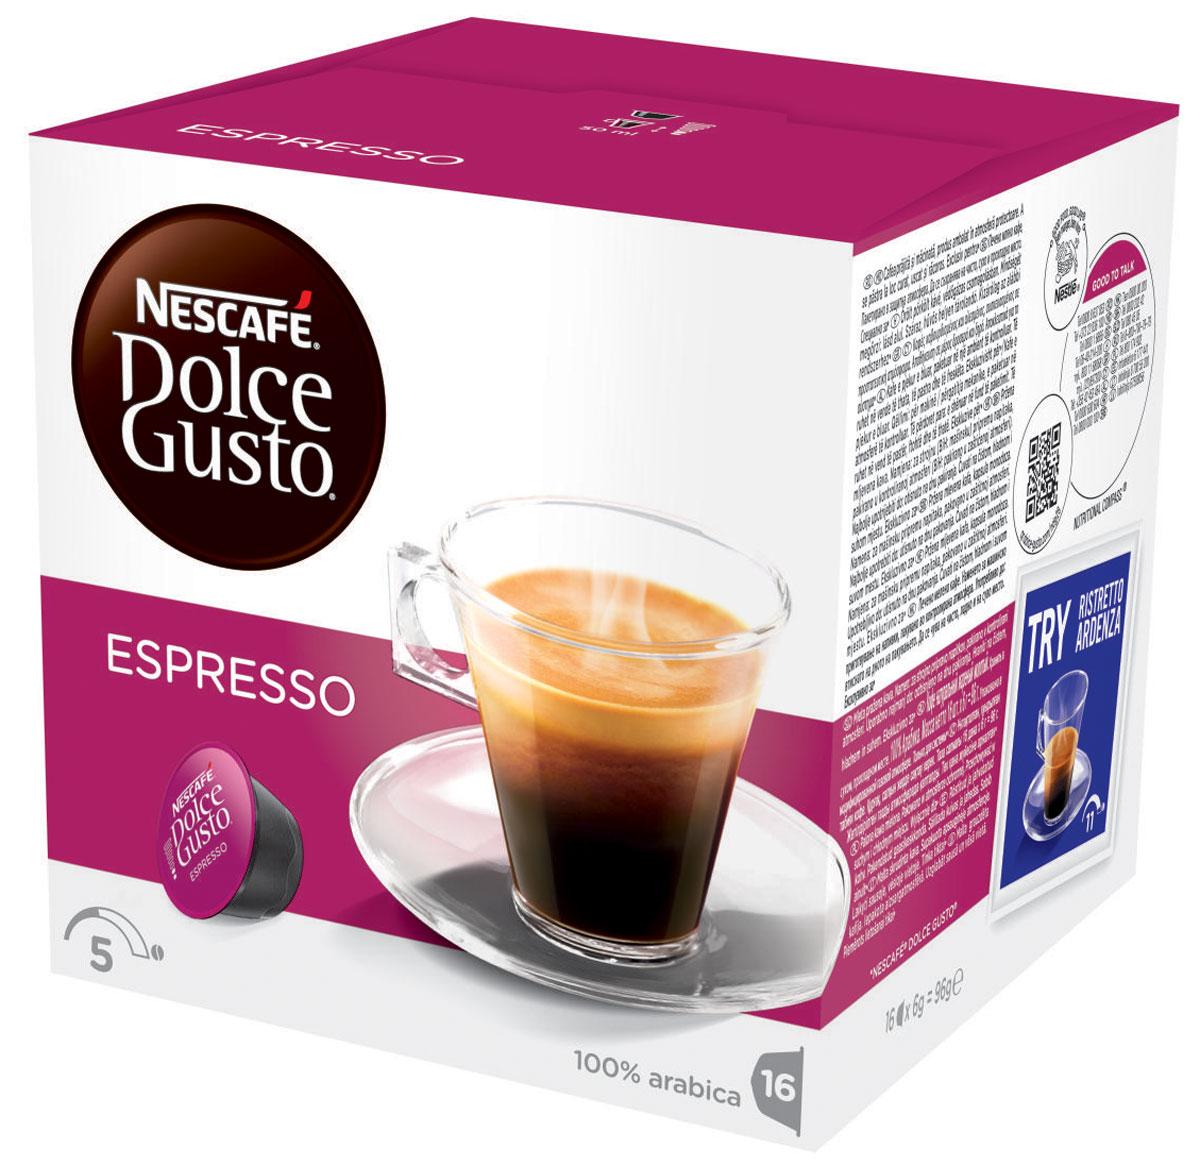 Nescafe Dolce Gusto Espresso кофе в капсулах, 16 шт tassimo jacobs espresso classico кофе в капсулах 16 шт